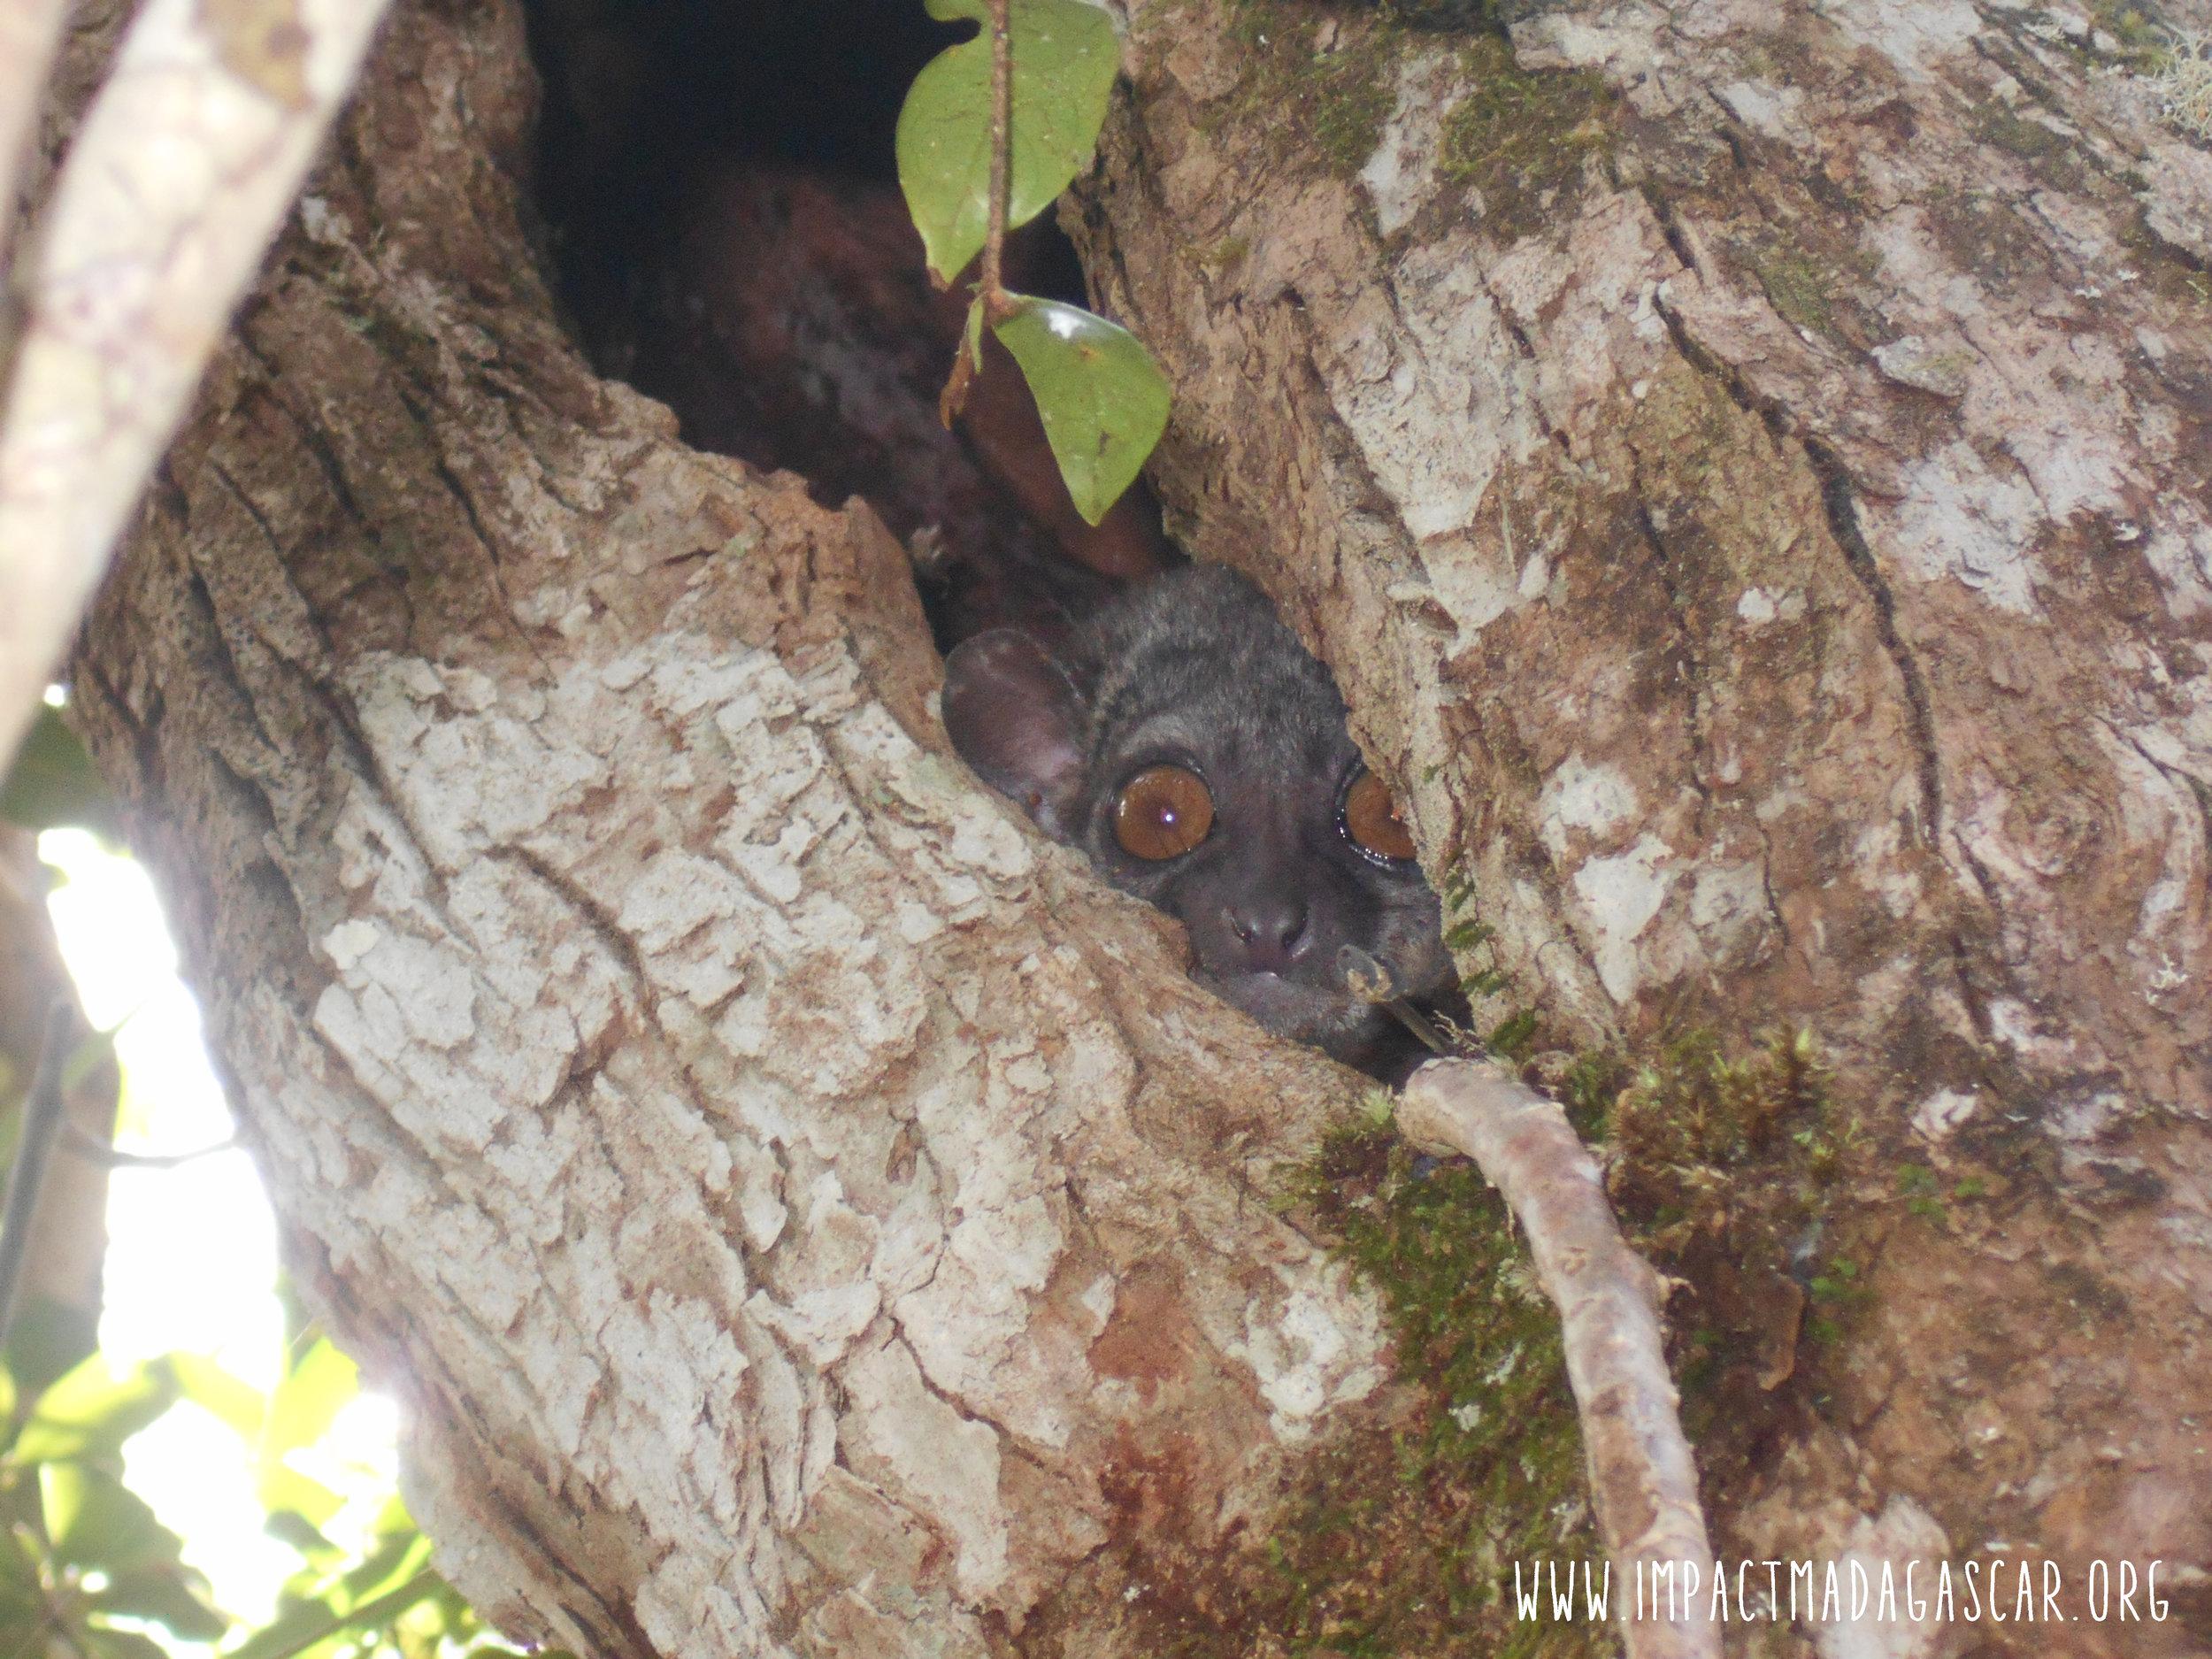 L. mustelinus  at sleeping in tree hole in Mantadia